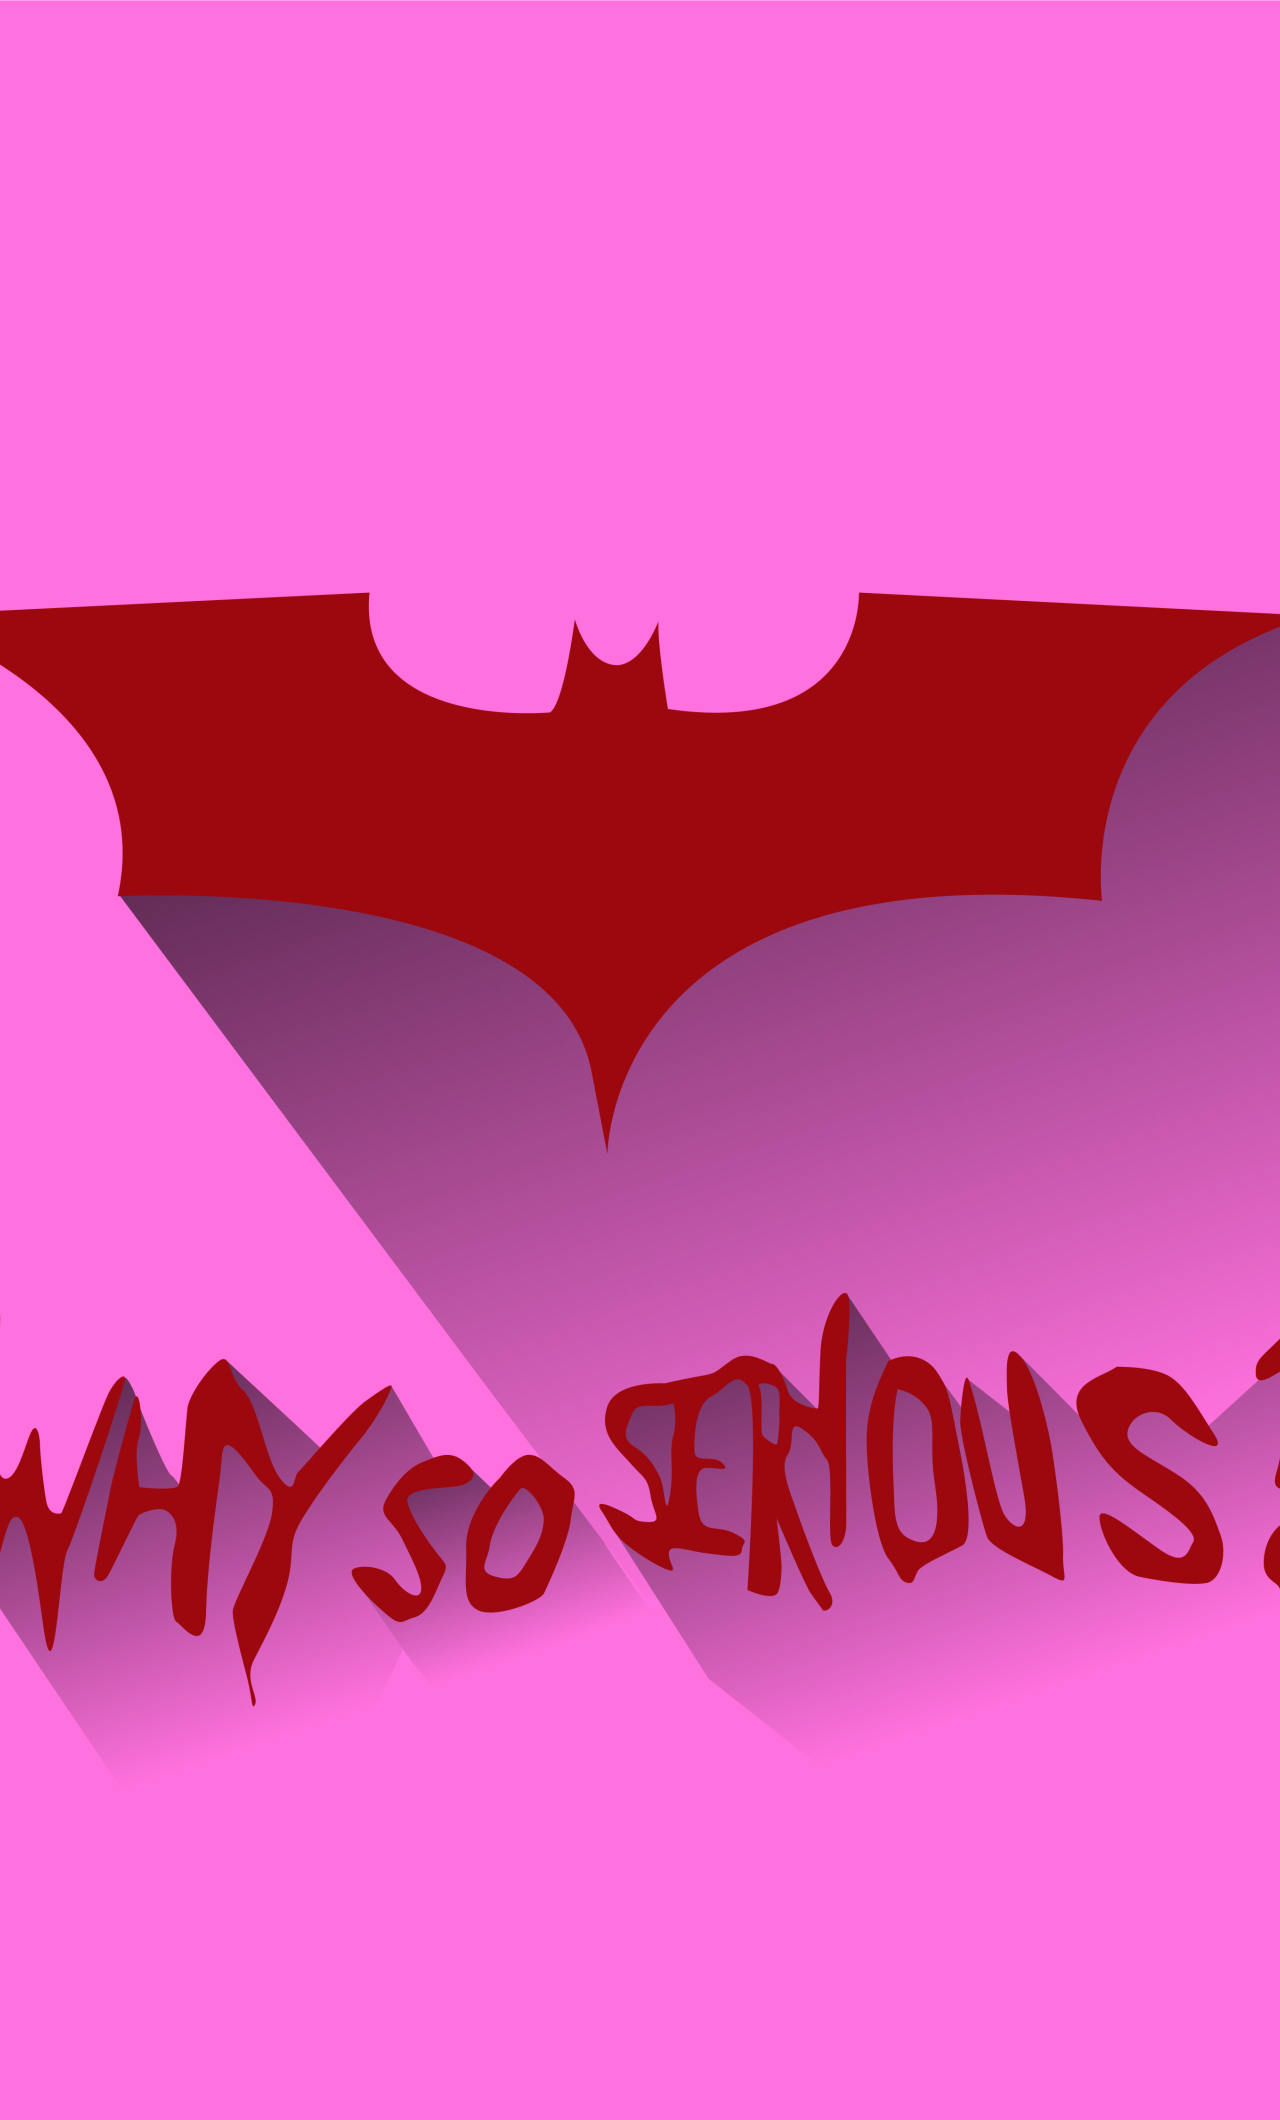 1280x2120 Batman Logo Why So Serious Iphone 6 Plus Wallpaper